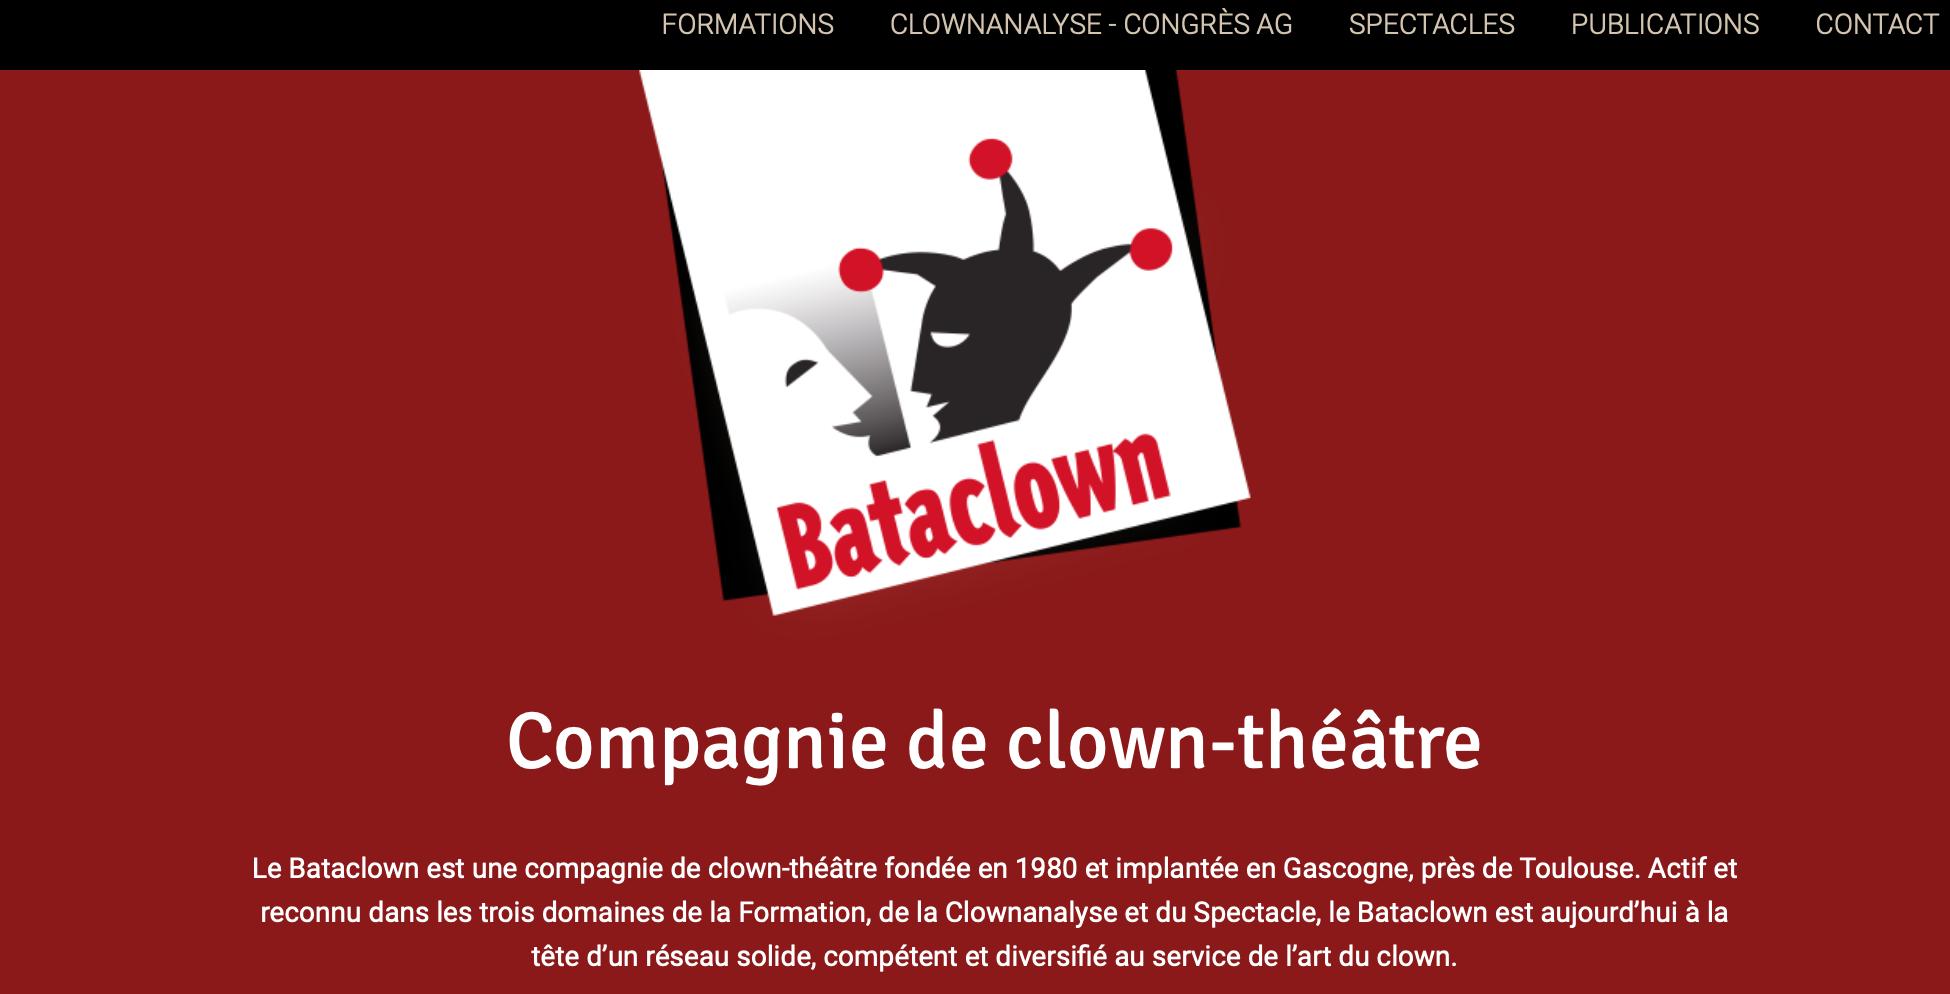 Bataclown - formation, clownanalyse et spectacle